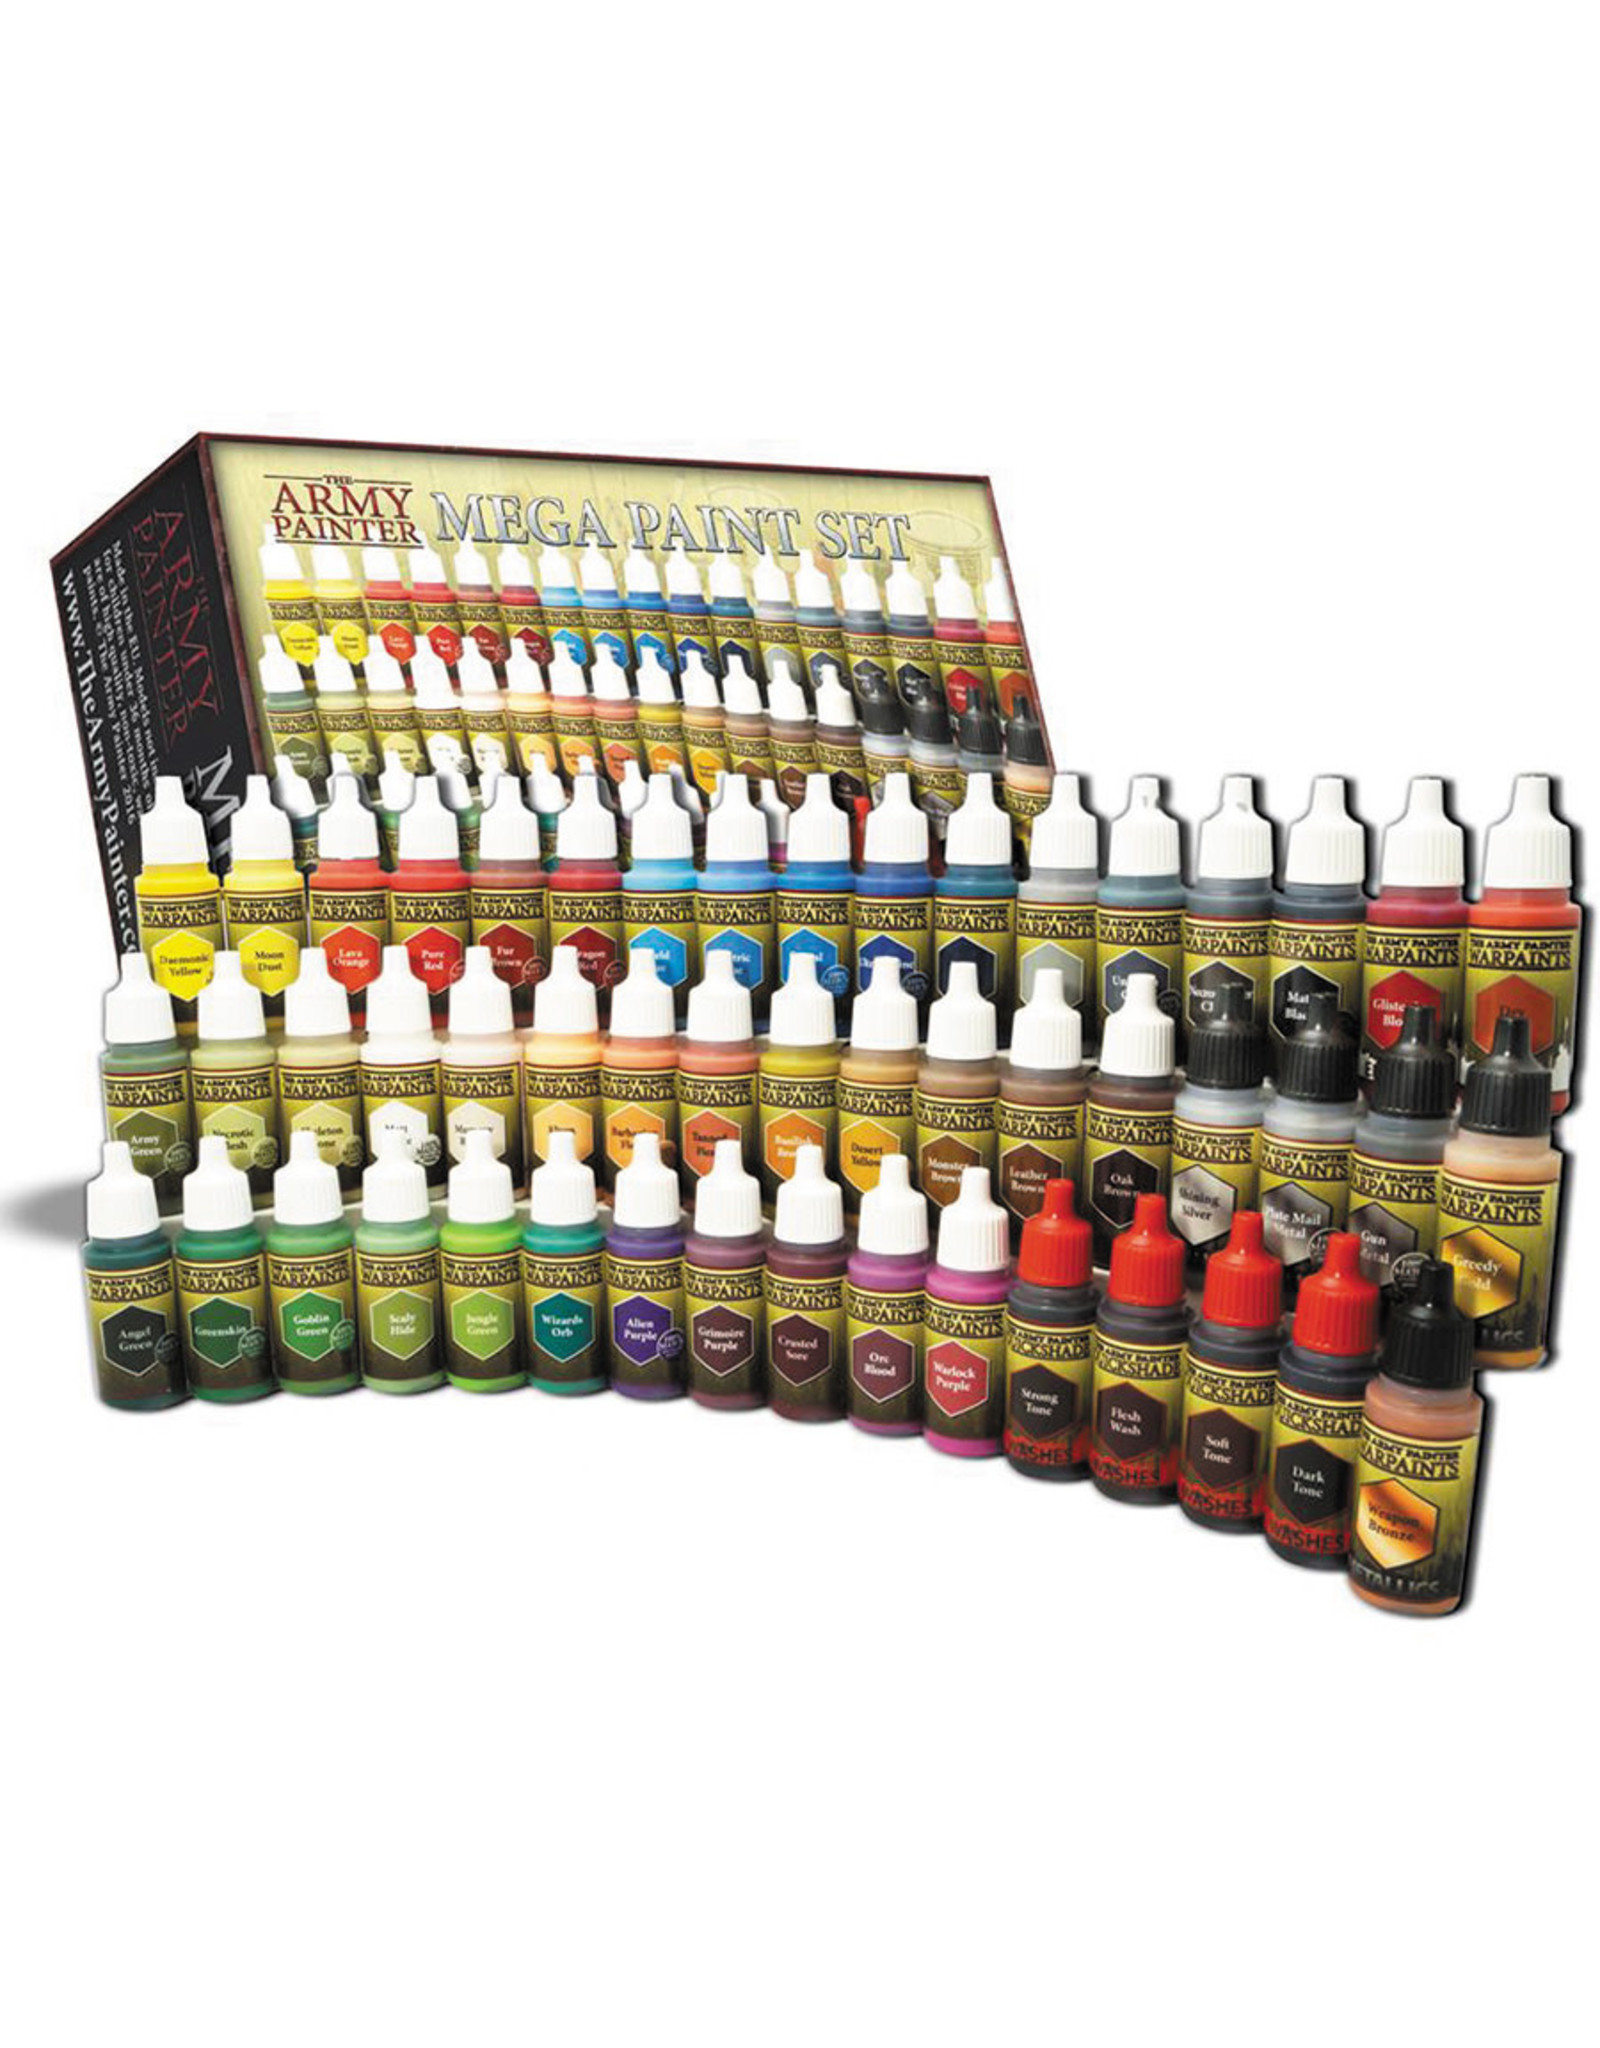 Army Painter Army Painter - Mega Paint Set